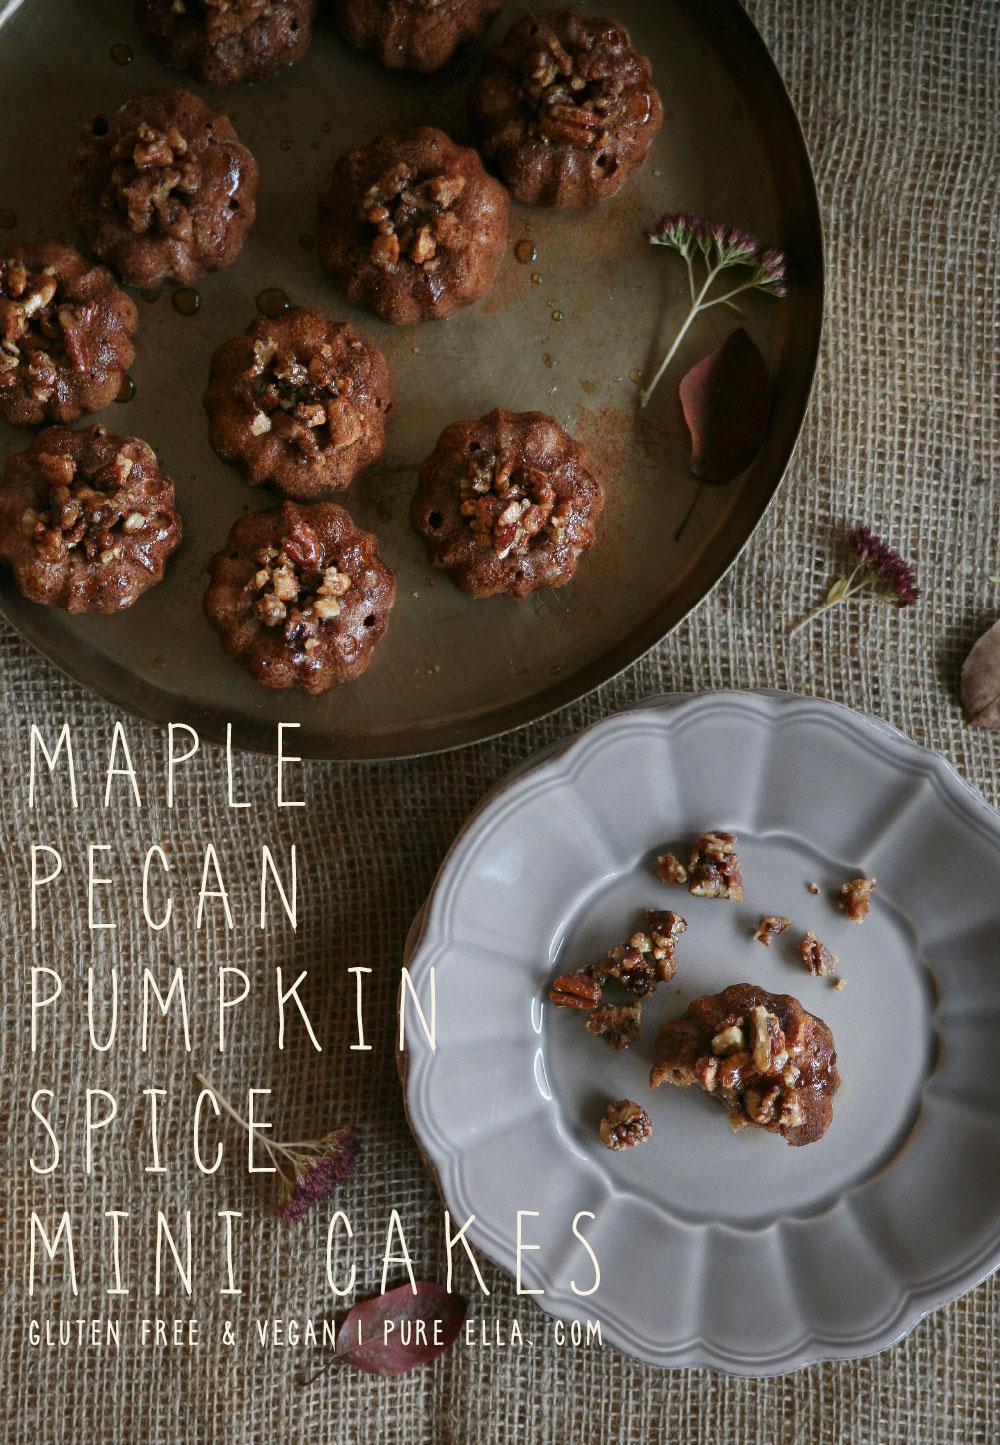 Pure-Ella-Maple-Pecan-Pumpkin-Spice-Gluten-free-Vegan